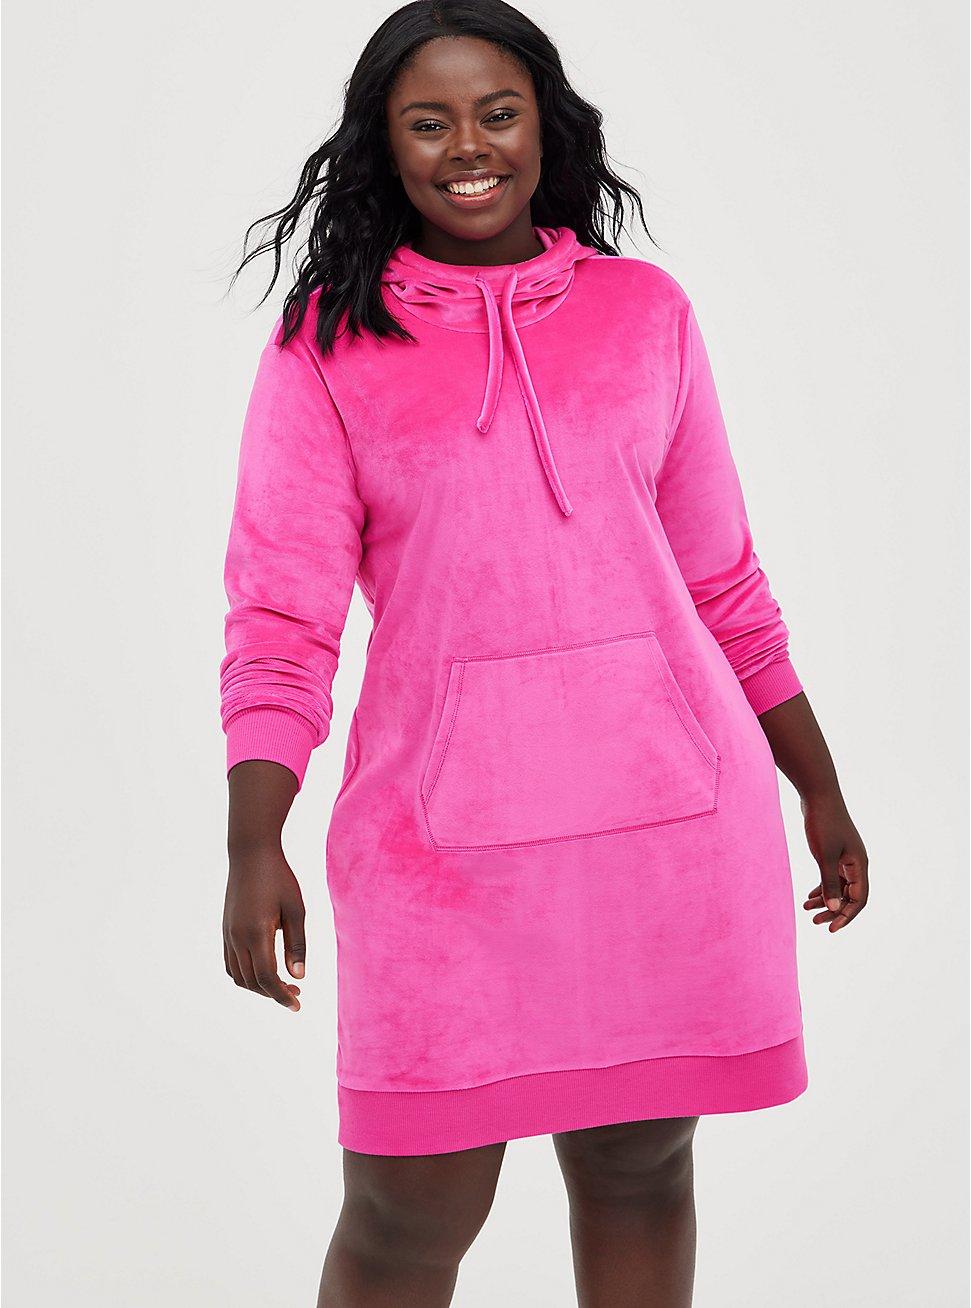 Hooded Sweatshirt Dress - Velour Pink, PINK GLO, hi-res